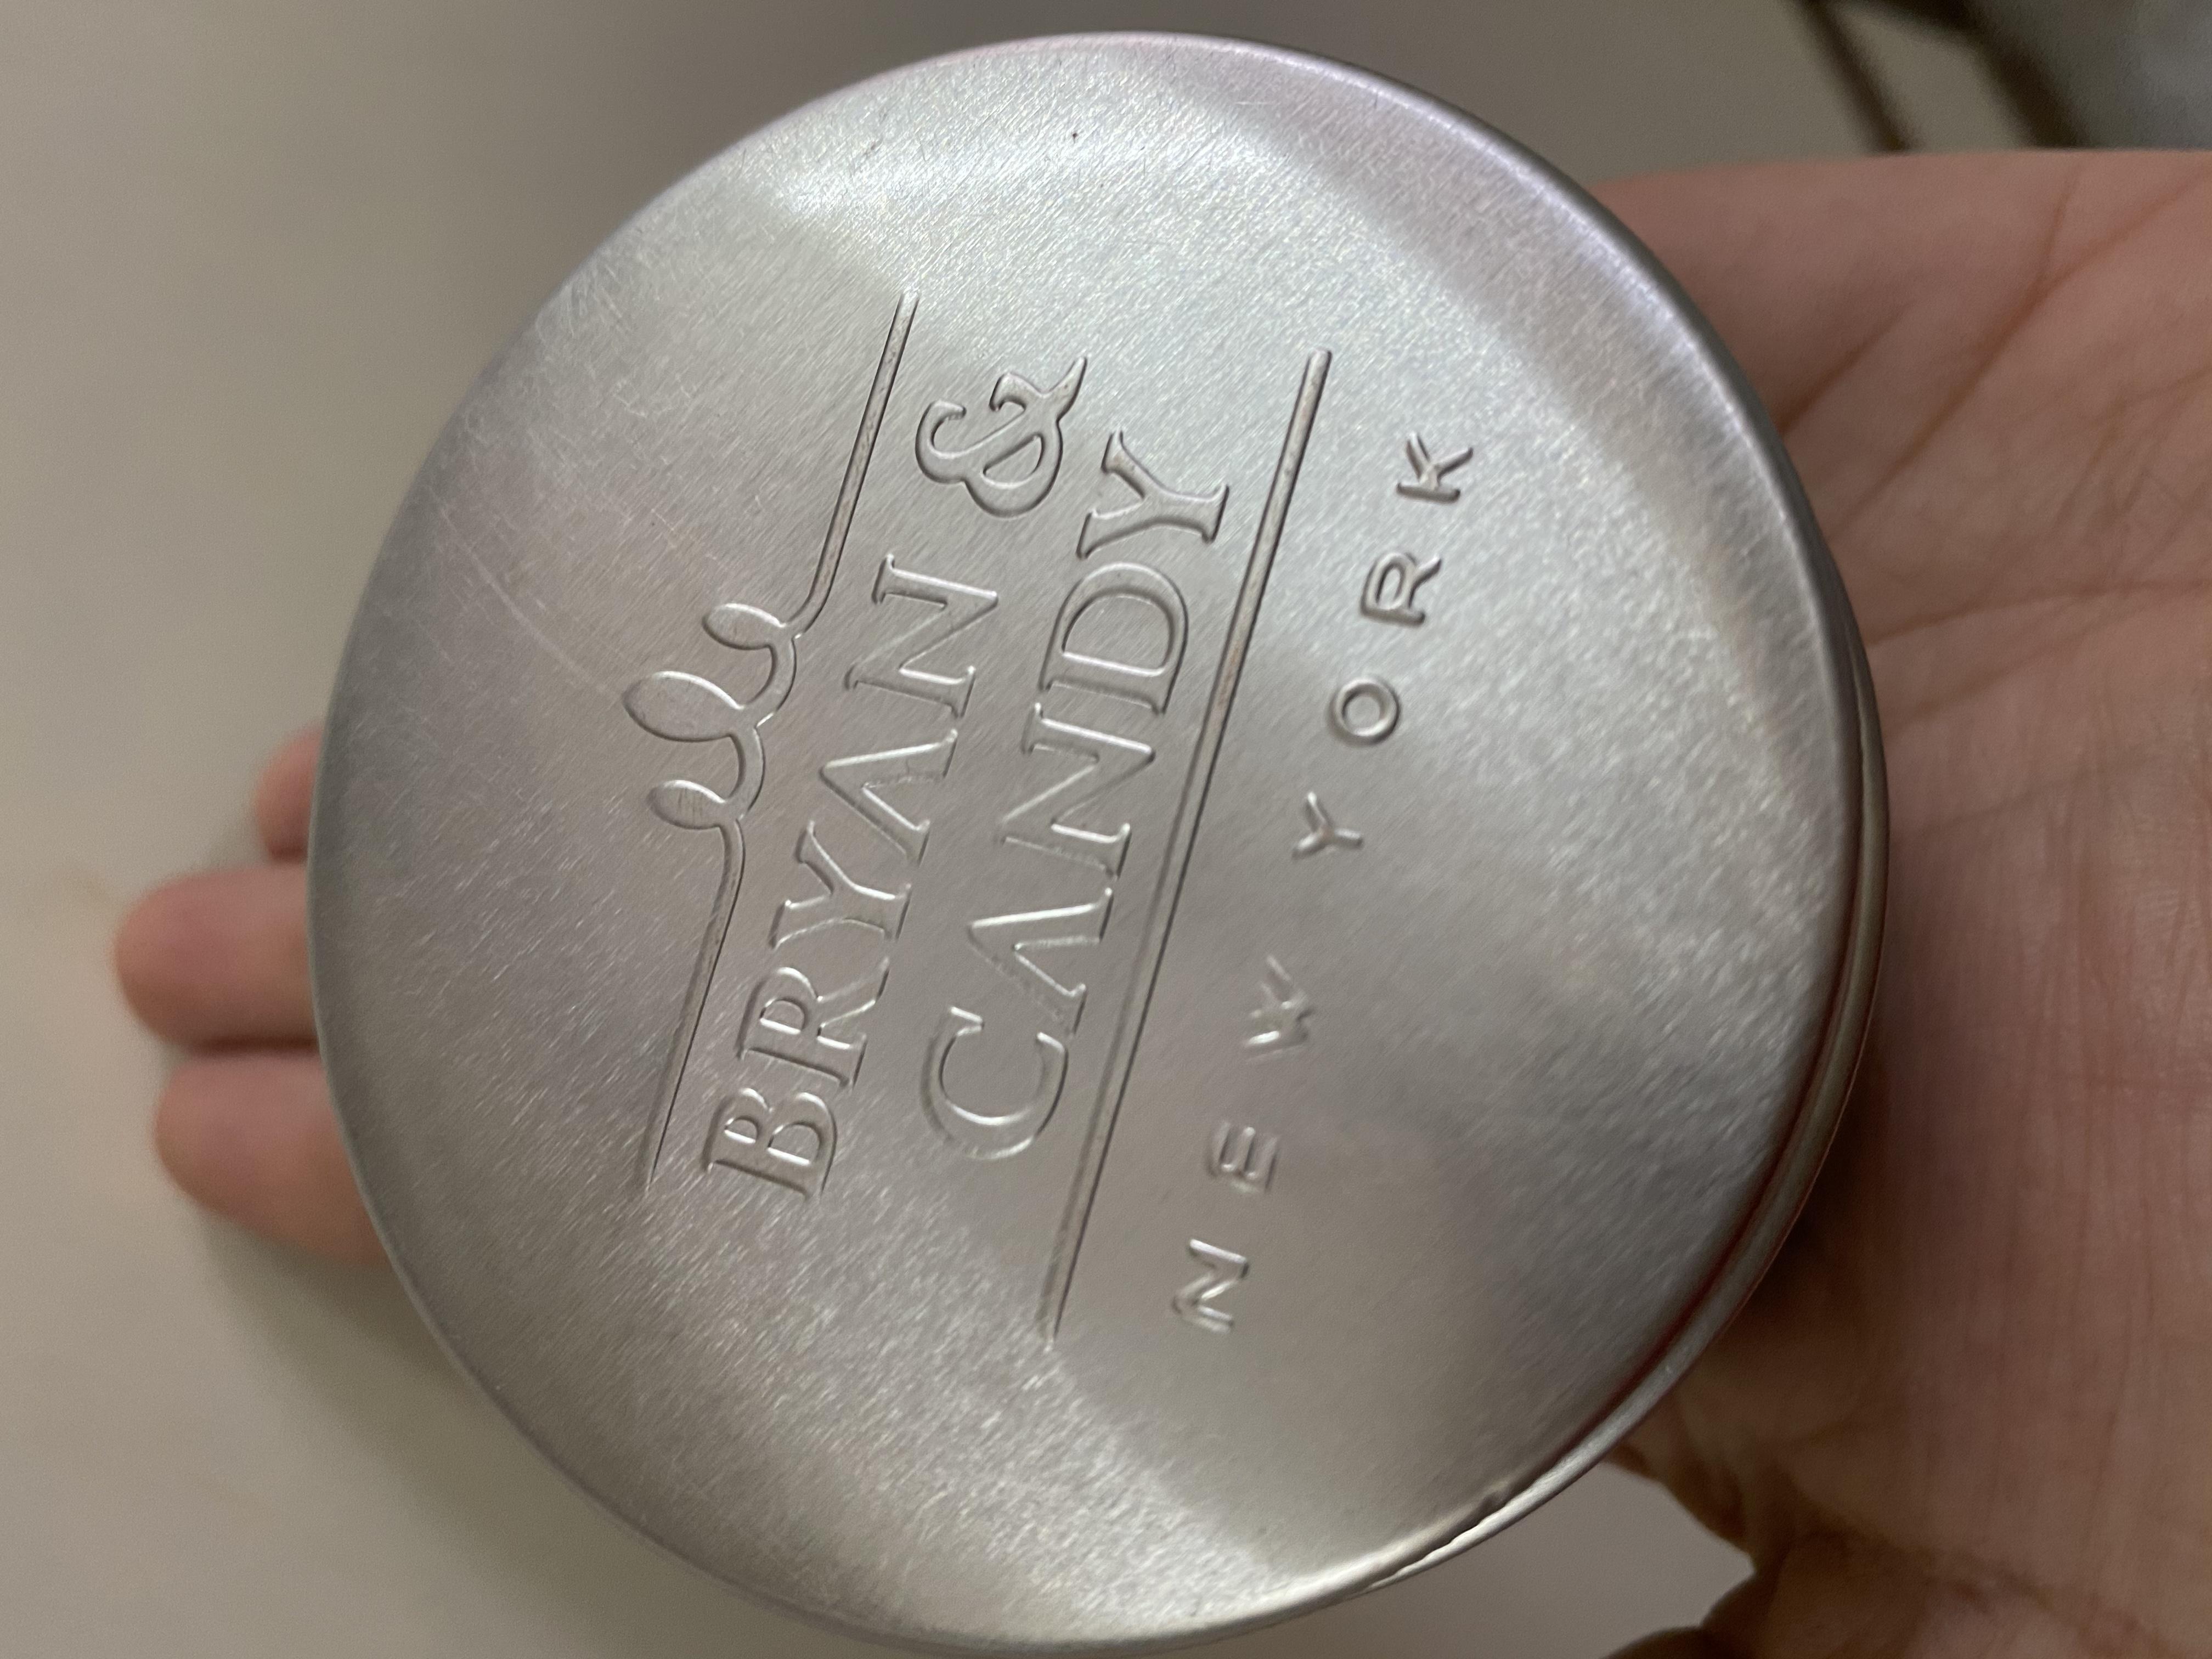 Bryan & Candy New York Green Tea Body Polish-Excellent exfoliator of dead skin cells !!-By binalithakkar83-1